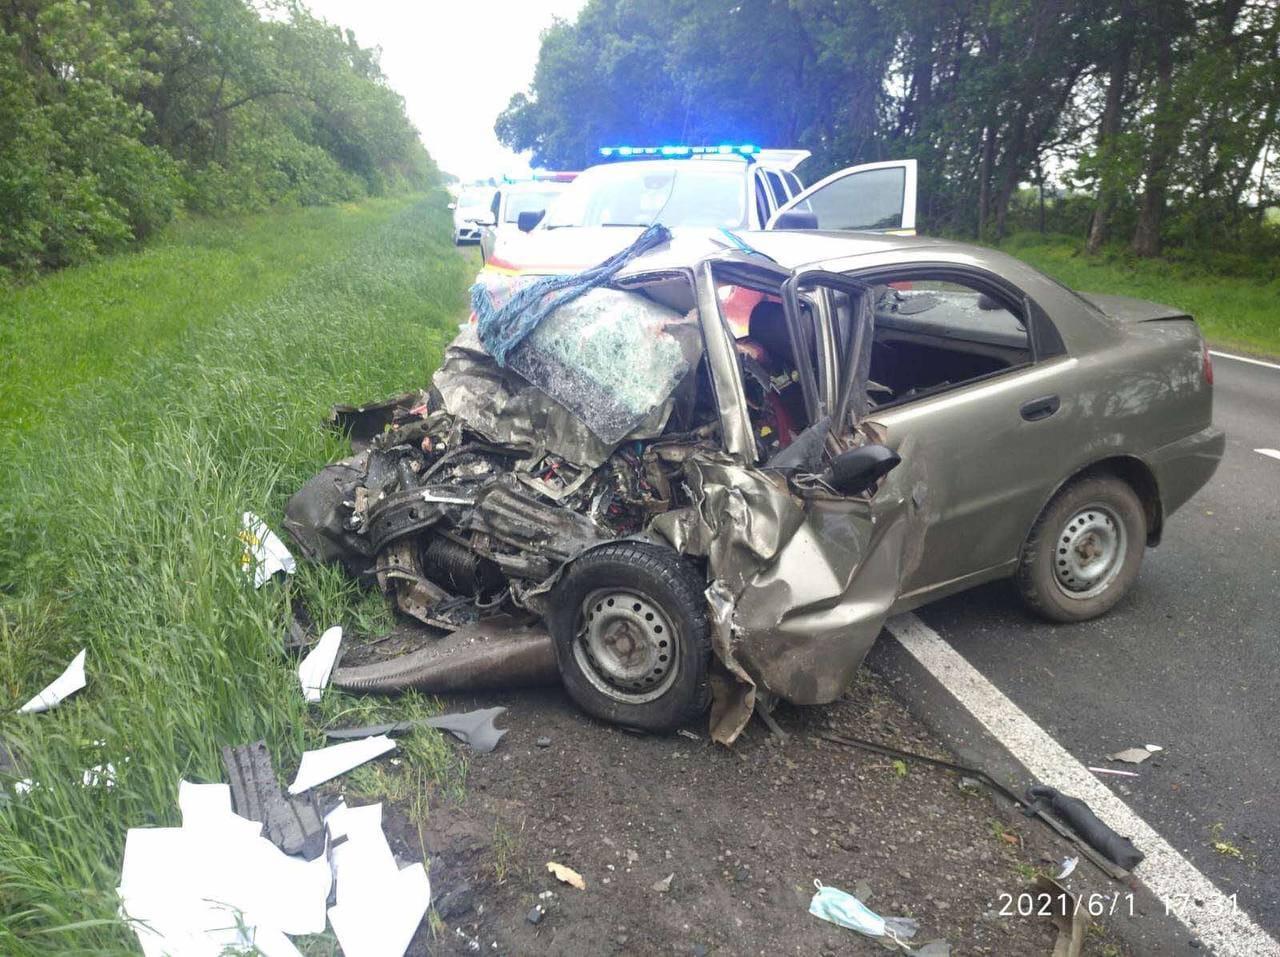 В ДТП на Харьковщине погибли 3 человека (фото)